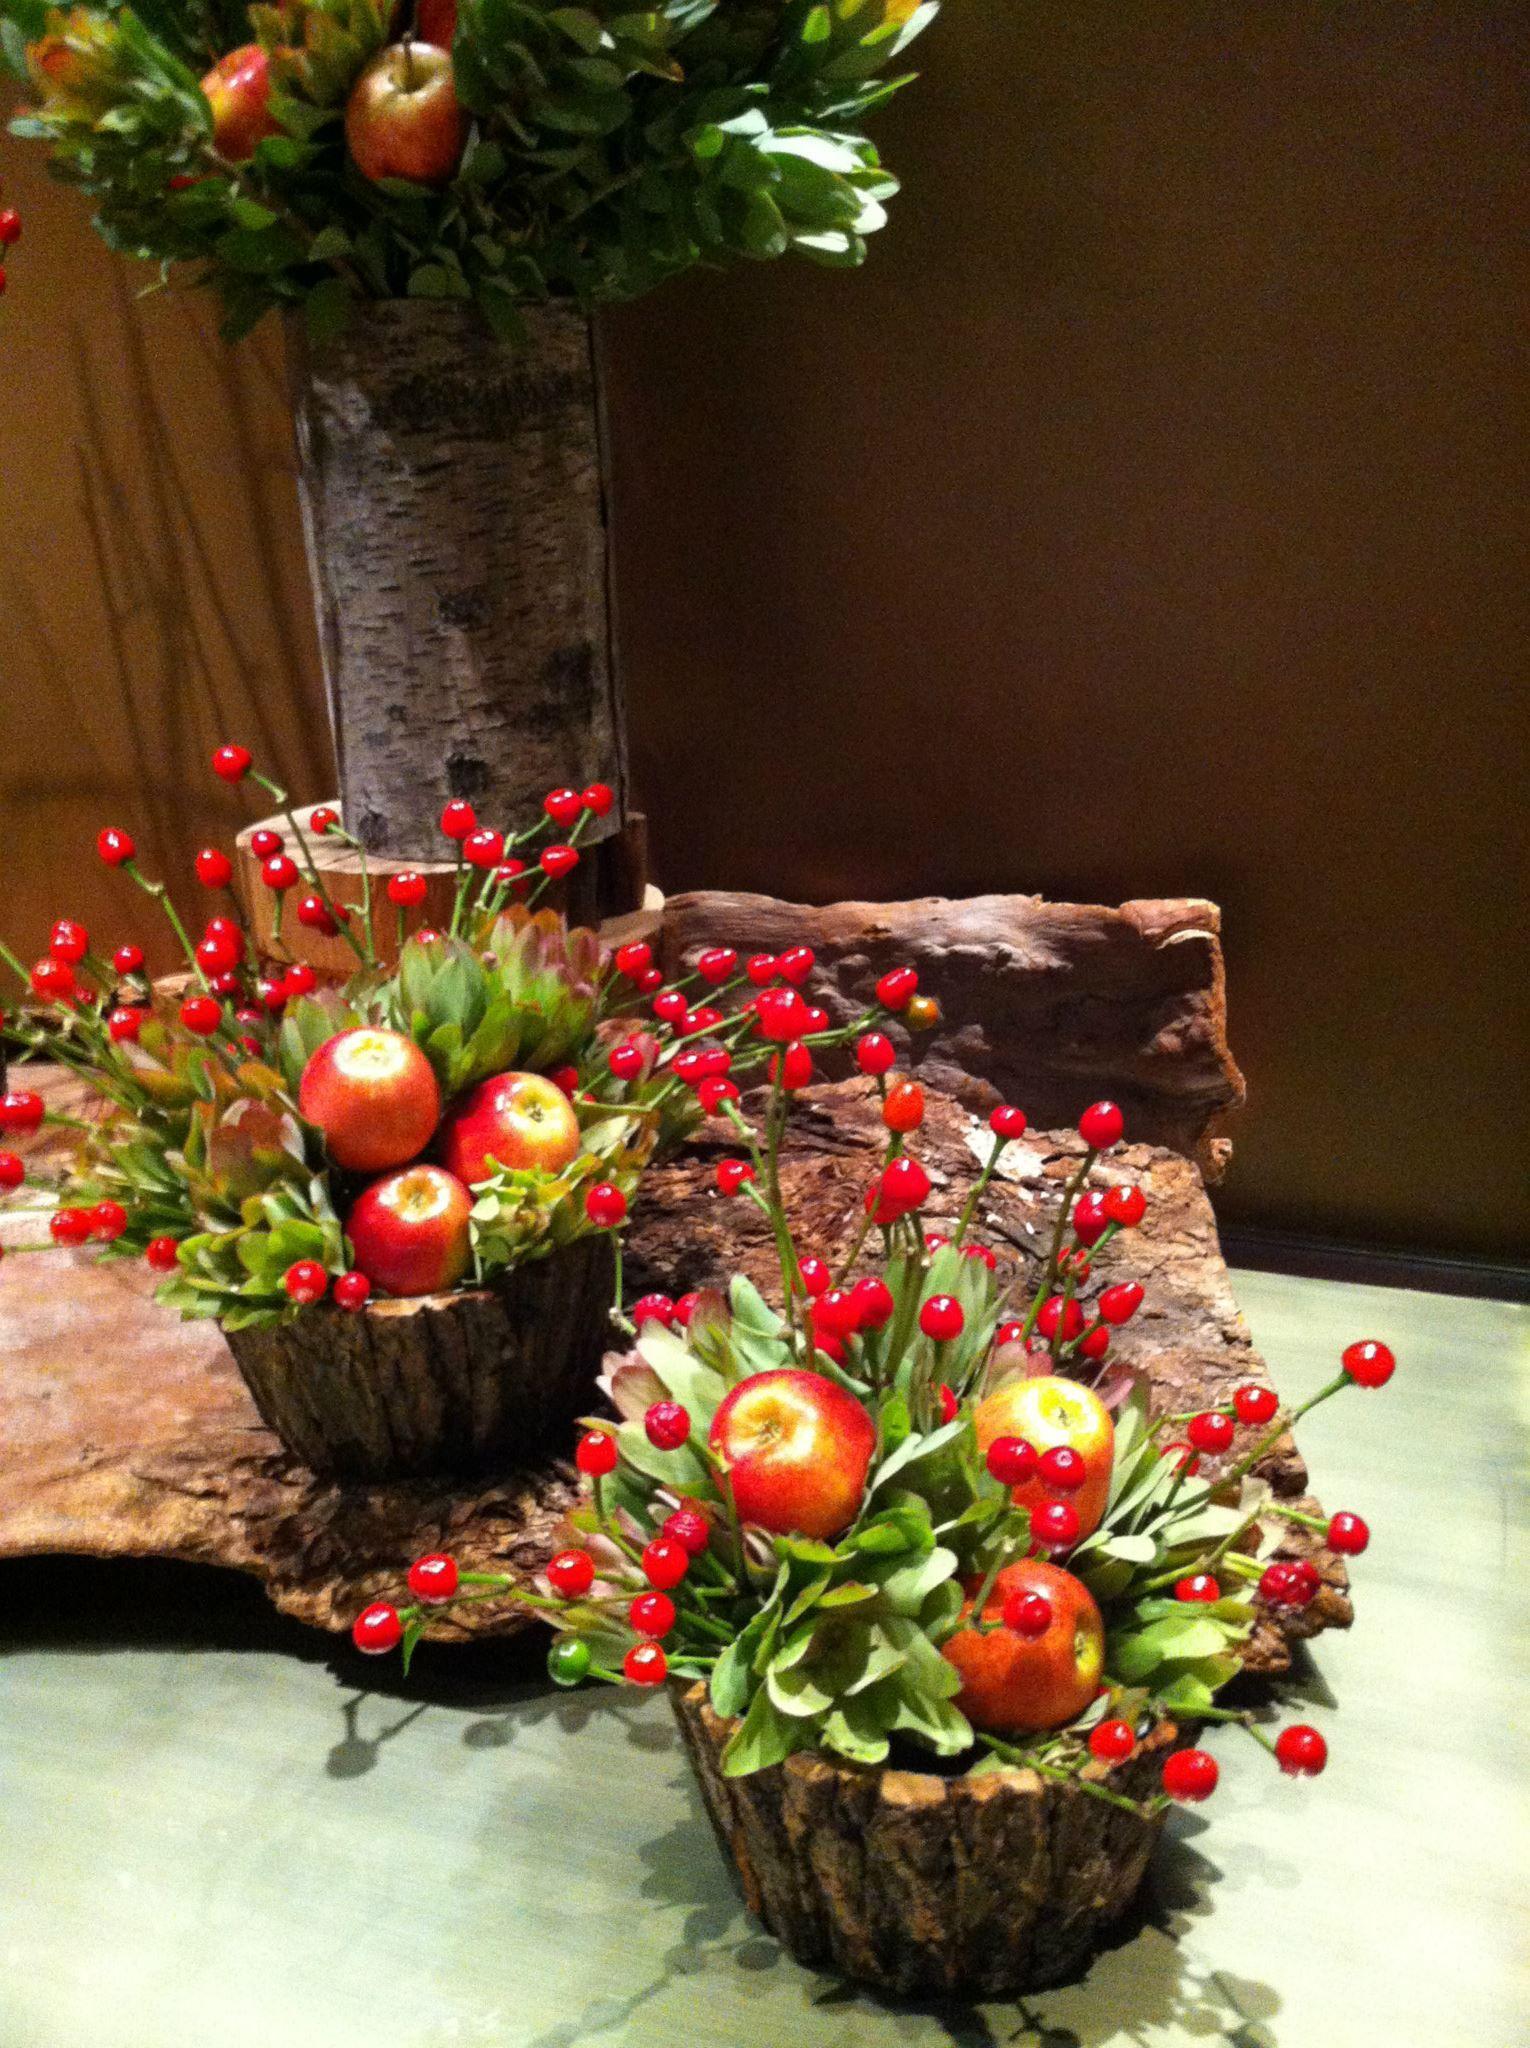 Pearsons Florist - apples, berries and bark